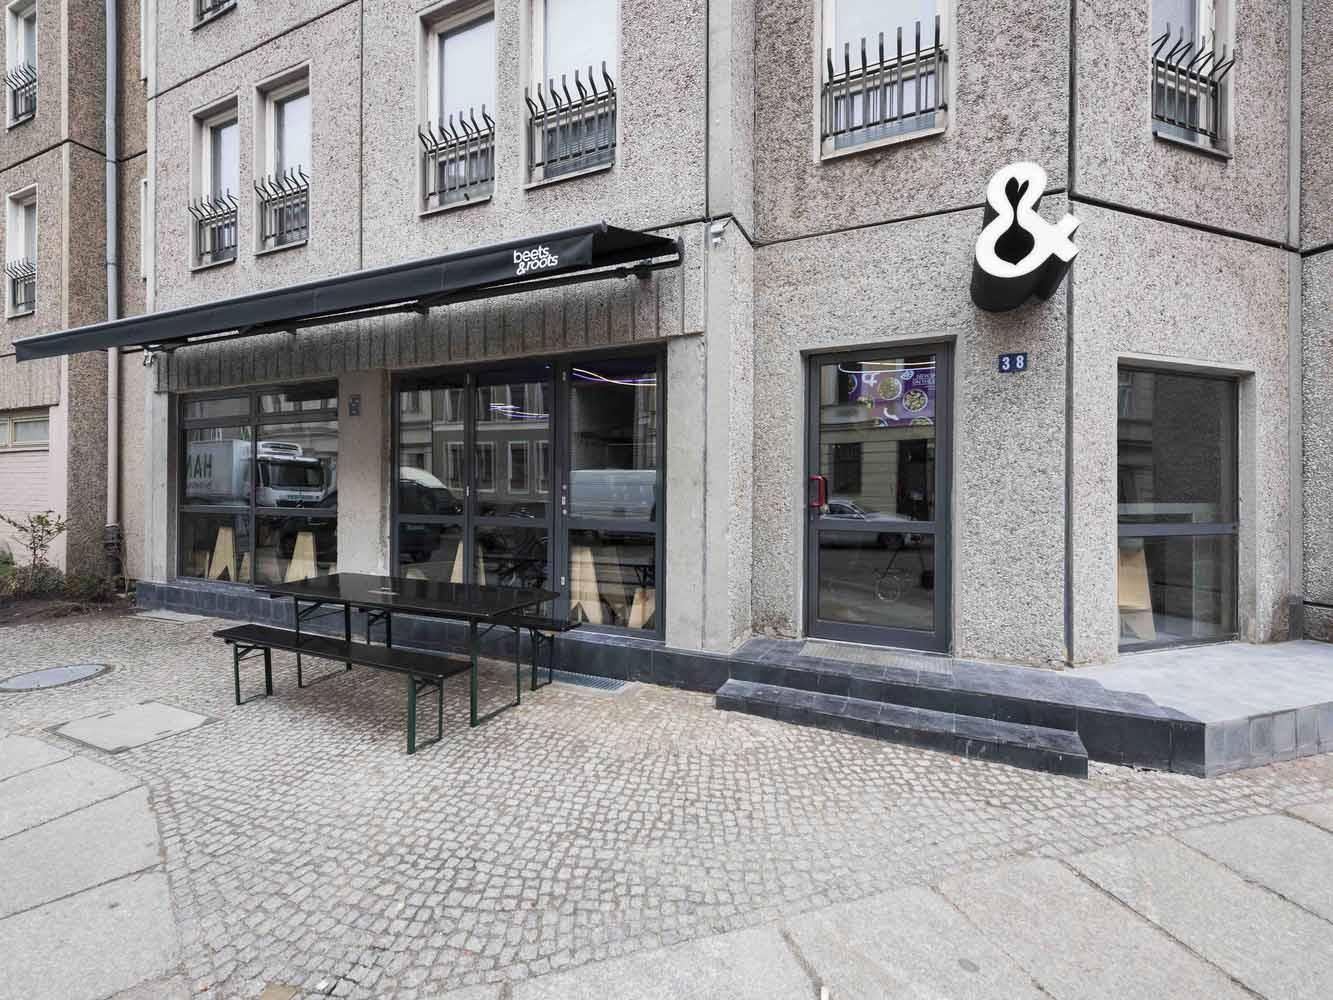 طراحی رستوران بیتز و روتز (Beets & Roots) برلین ؛ مهندس معمار گونزالس هاسه (Gonzalez Haase)